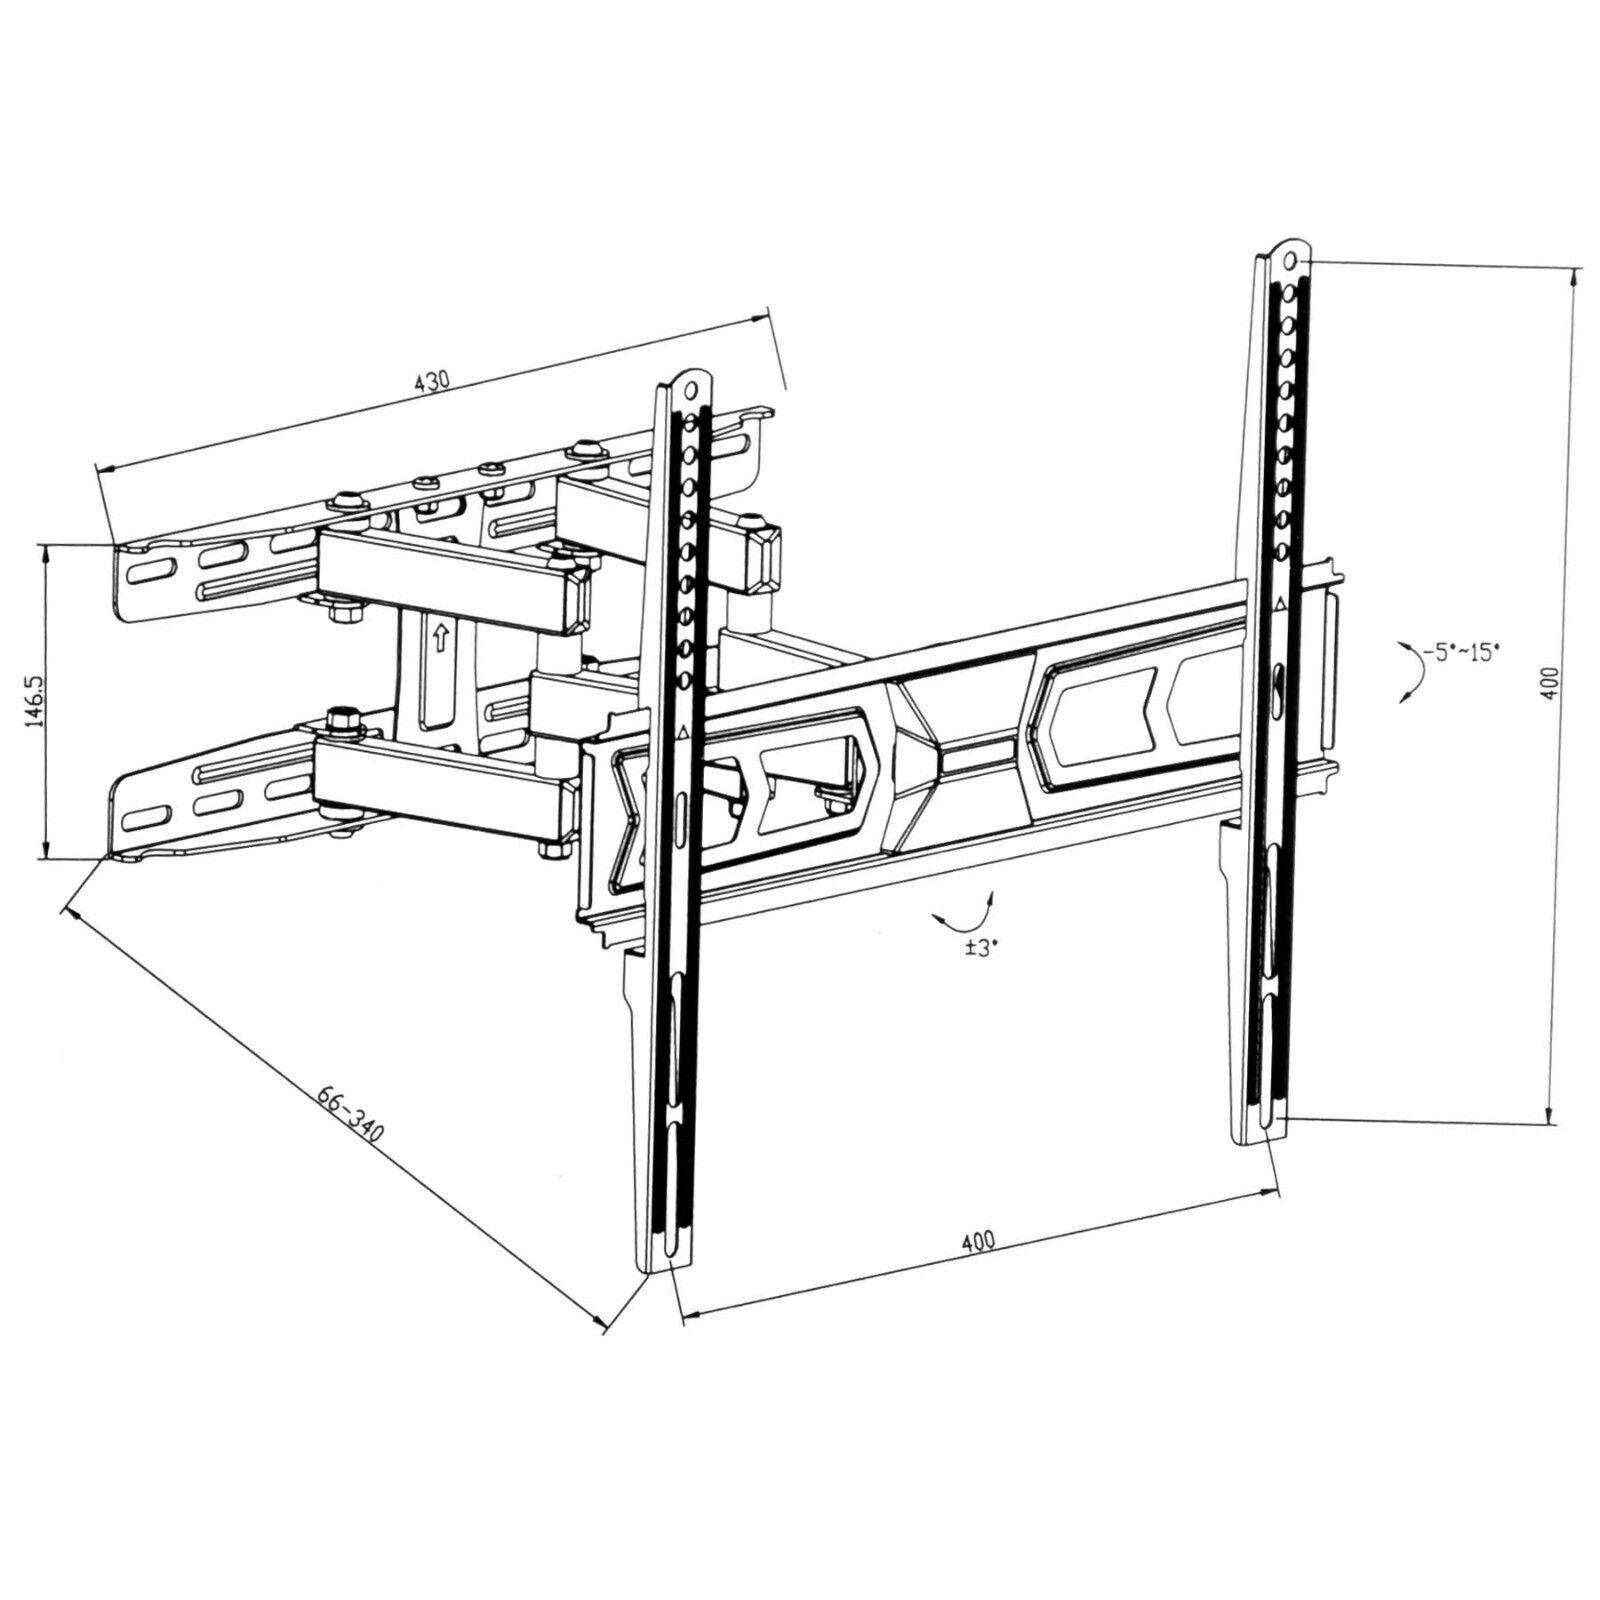 lcd led tv fernseher wandhalter wandhalterung neigbar schwenkbar 32 55 zoll eur 30 99. Black Bedroom Furniture Sets. Home Design Ideas